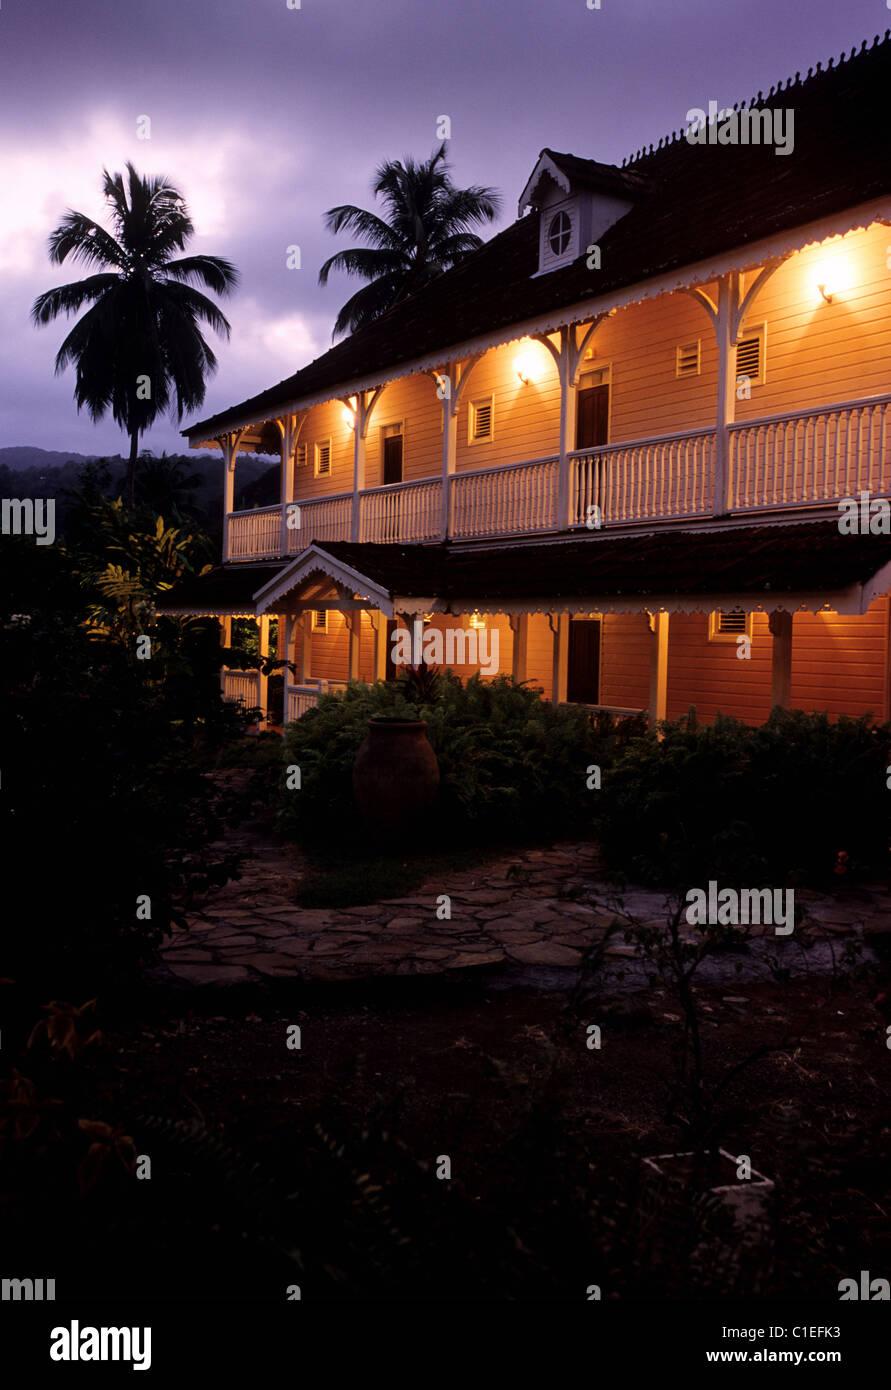 France, Martinique Island, Le Marigot village, Habitation